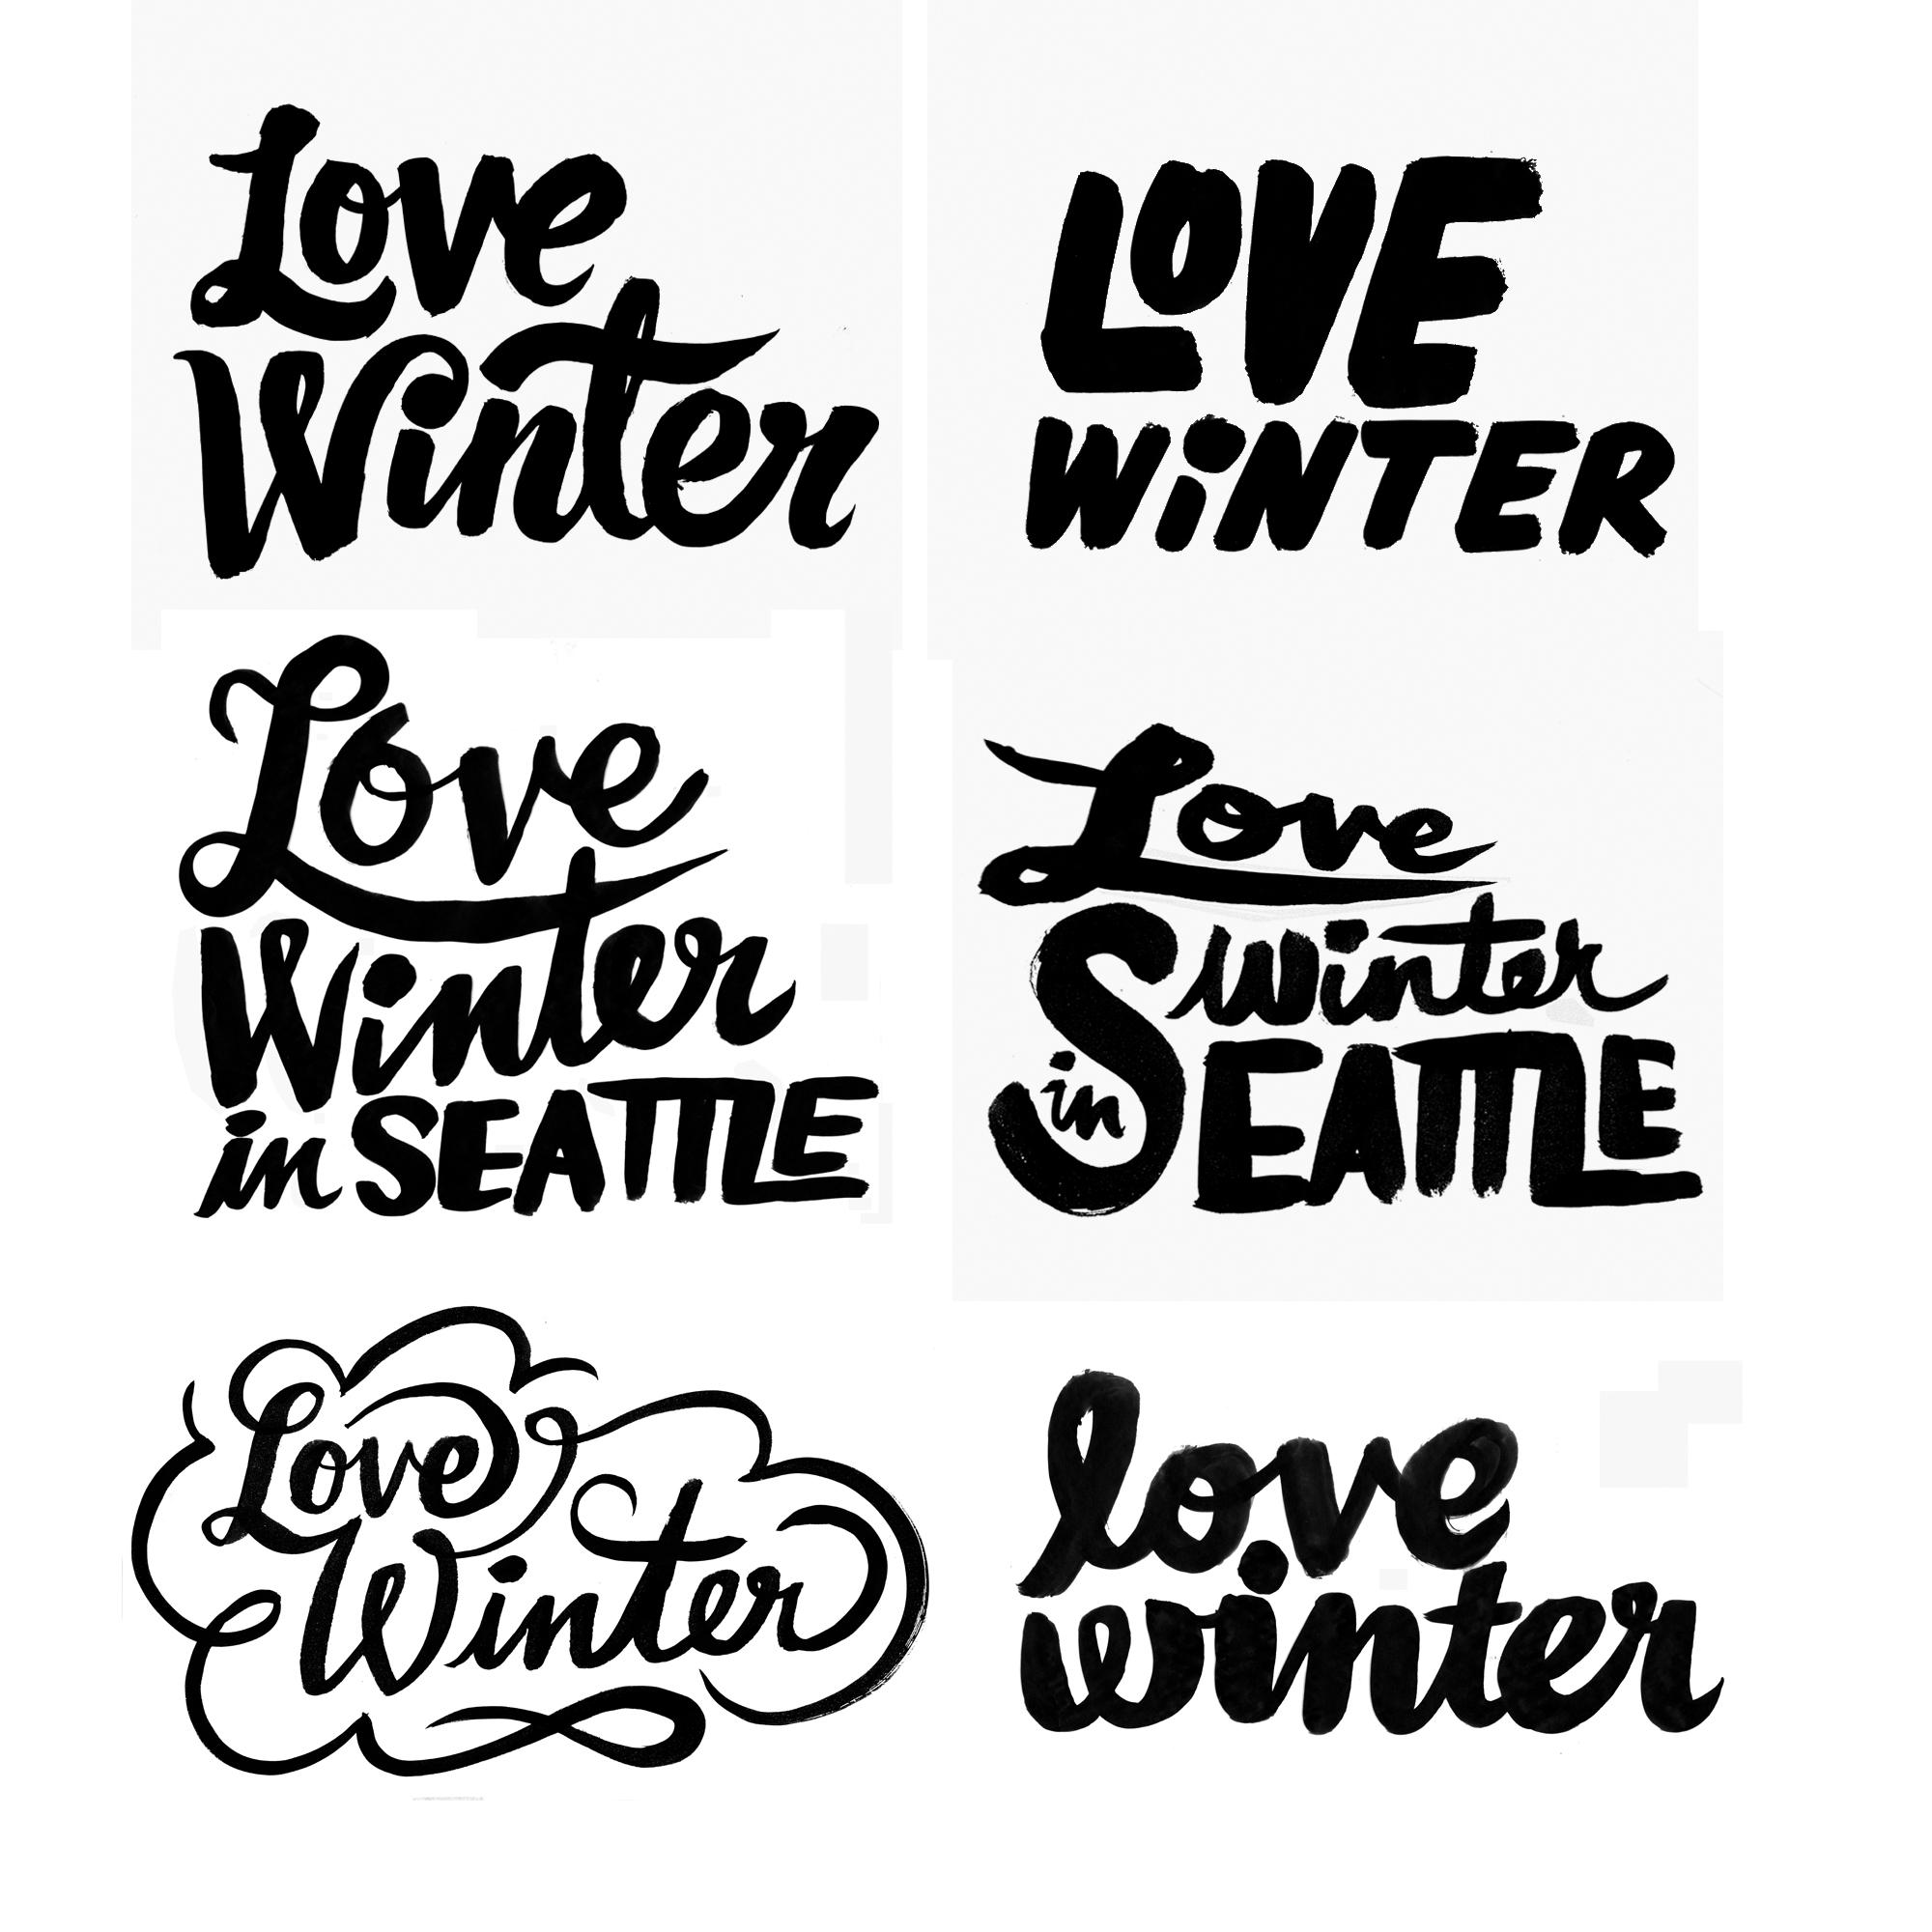 Erik Marinovich - Seattle Met magazine lettering exploratory